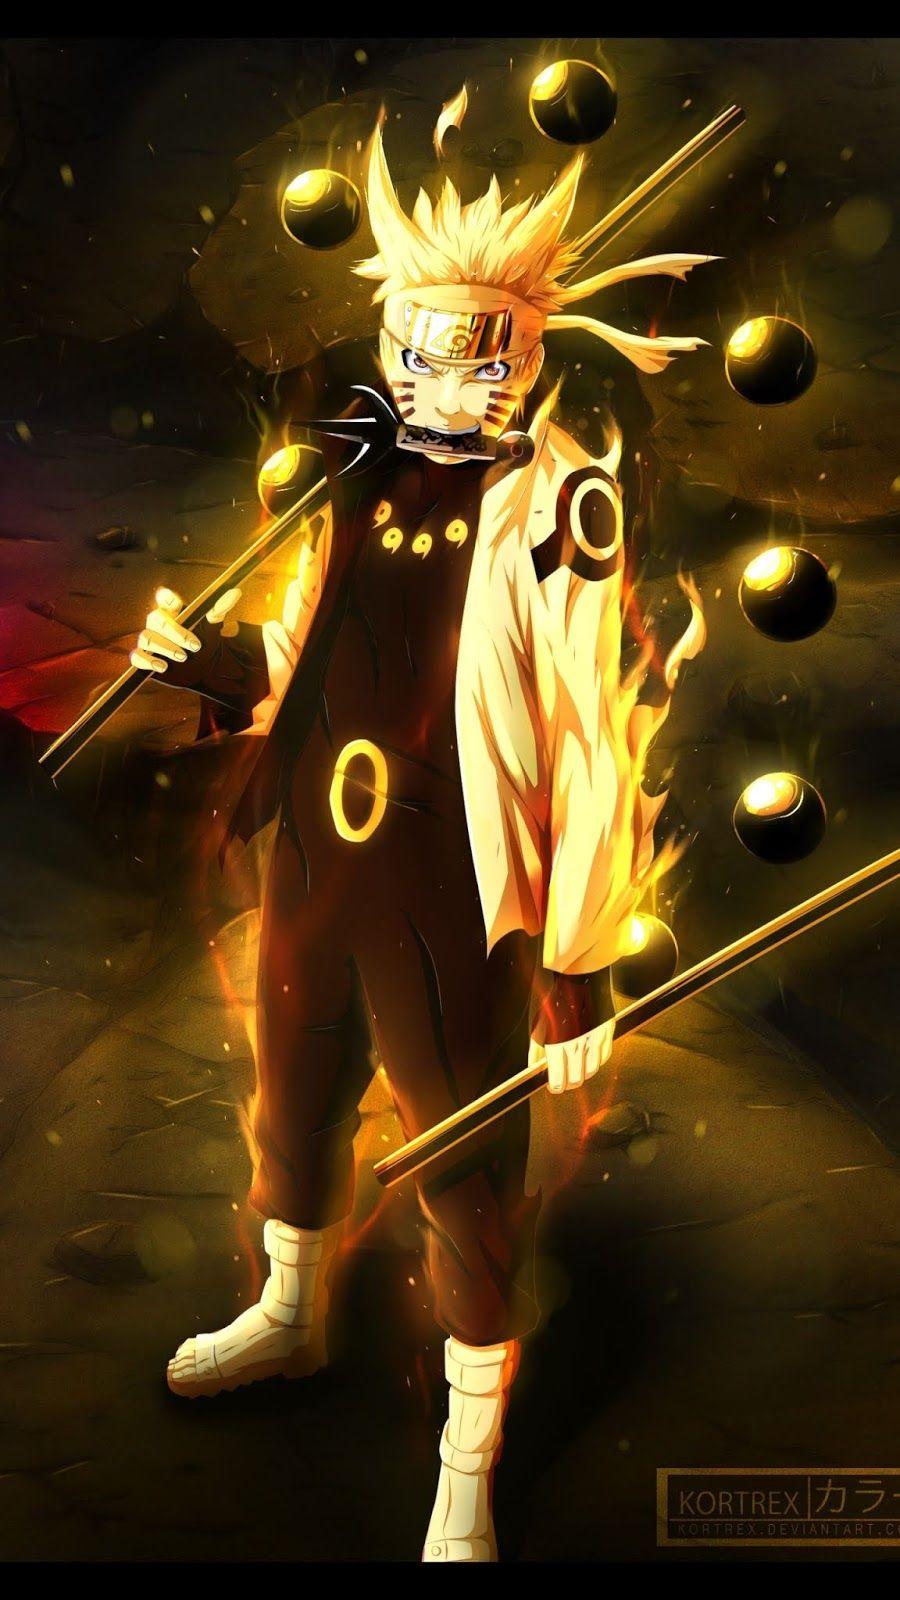 Naruto Boruto Wallpaper For Iphone And Android Part 1 In 2020 Naruto Uzumaki Naruto Anime Naruto